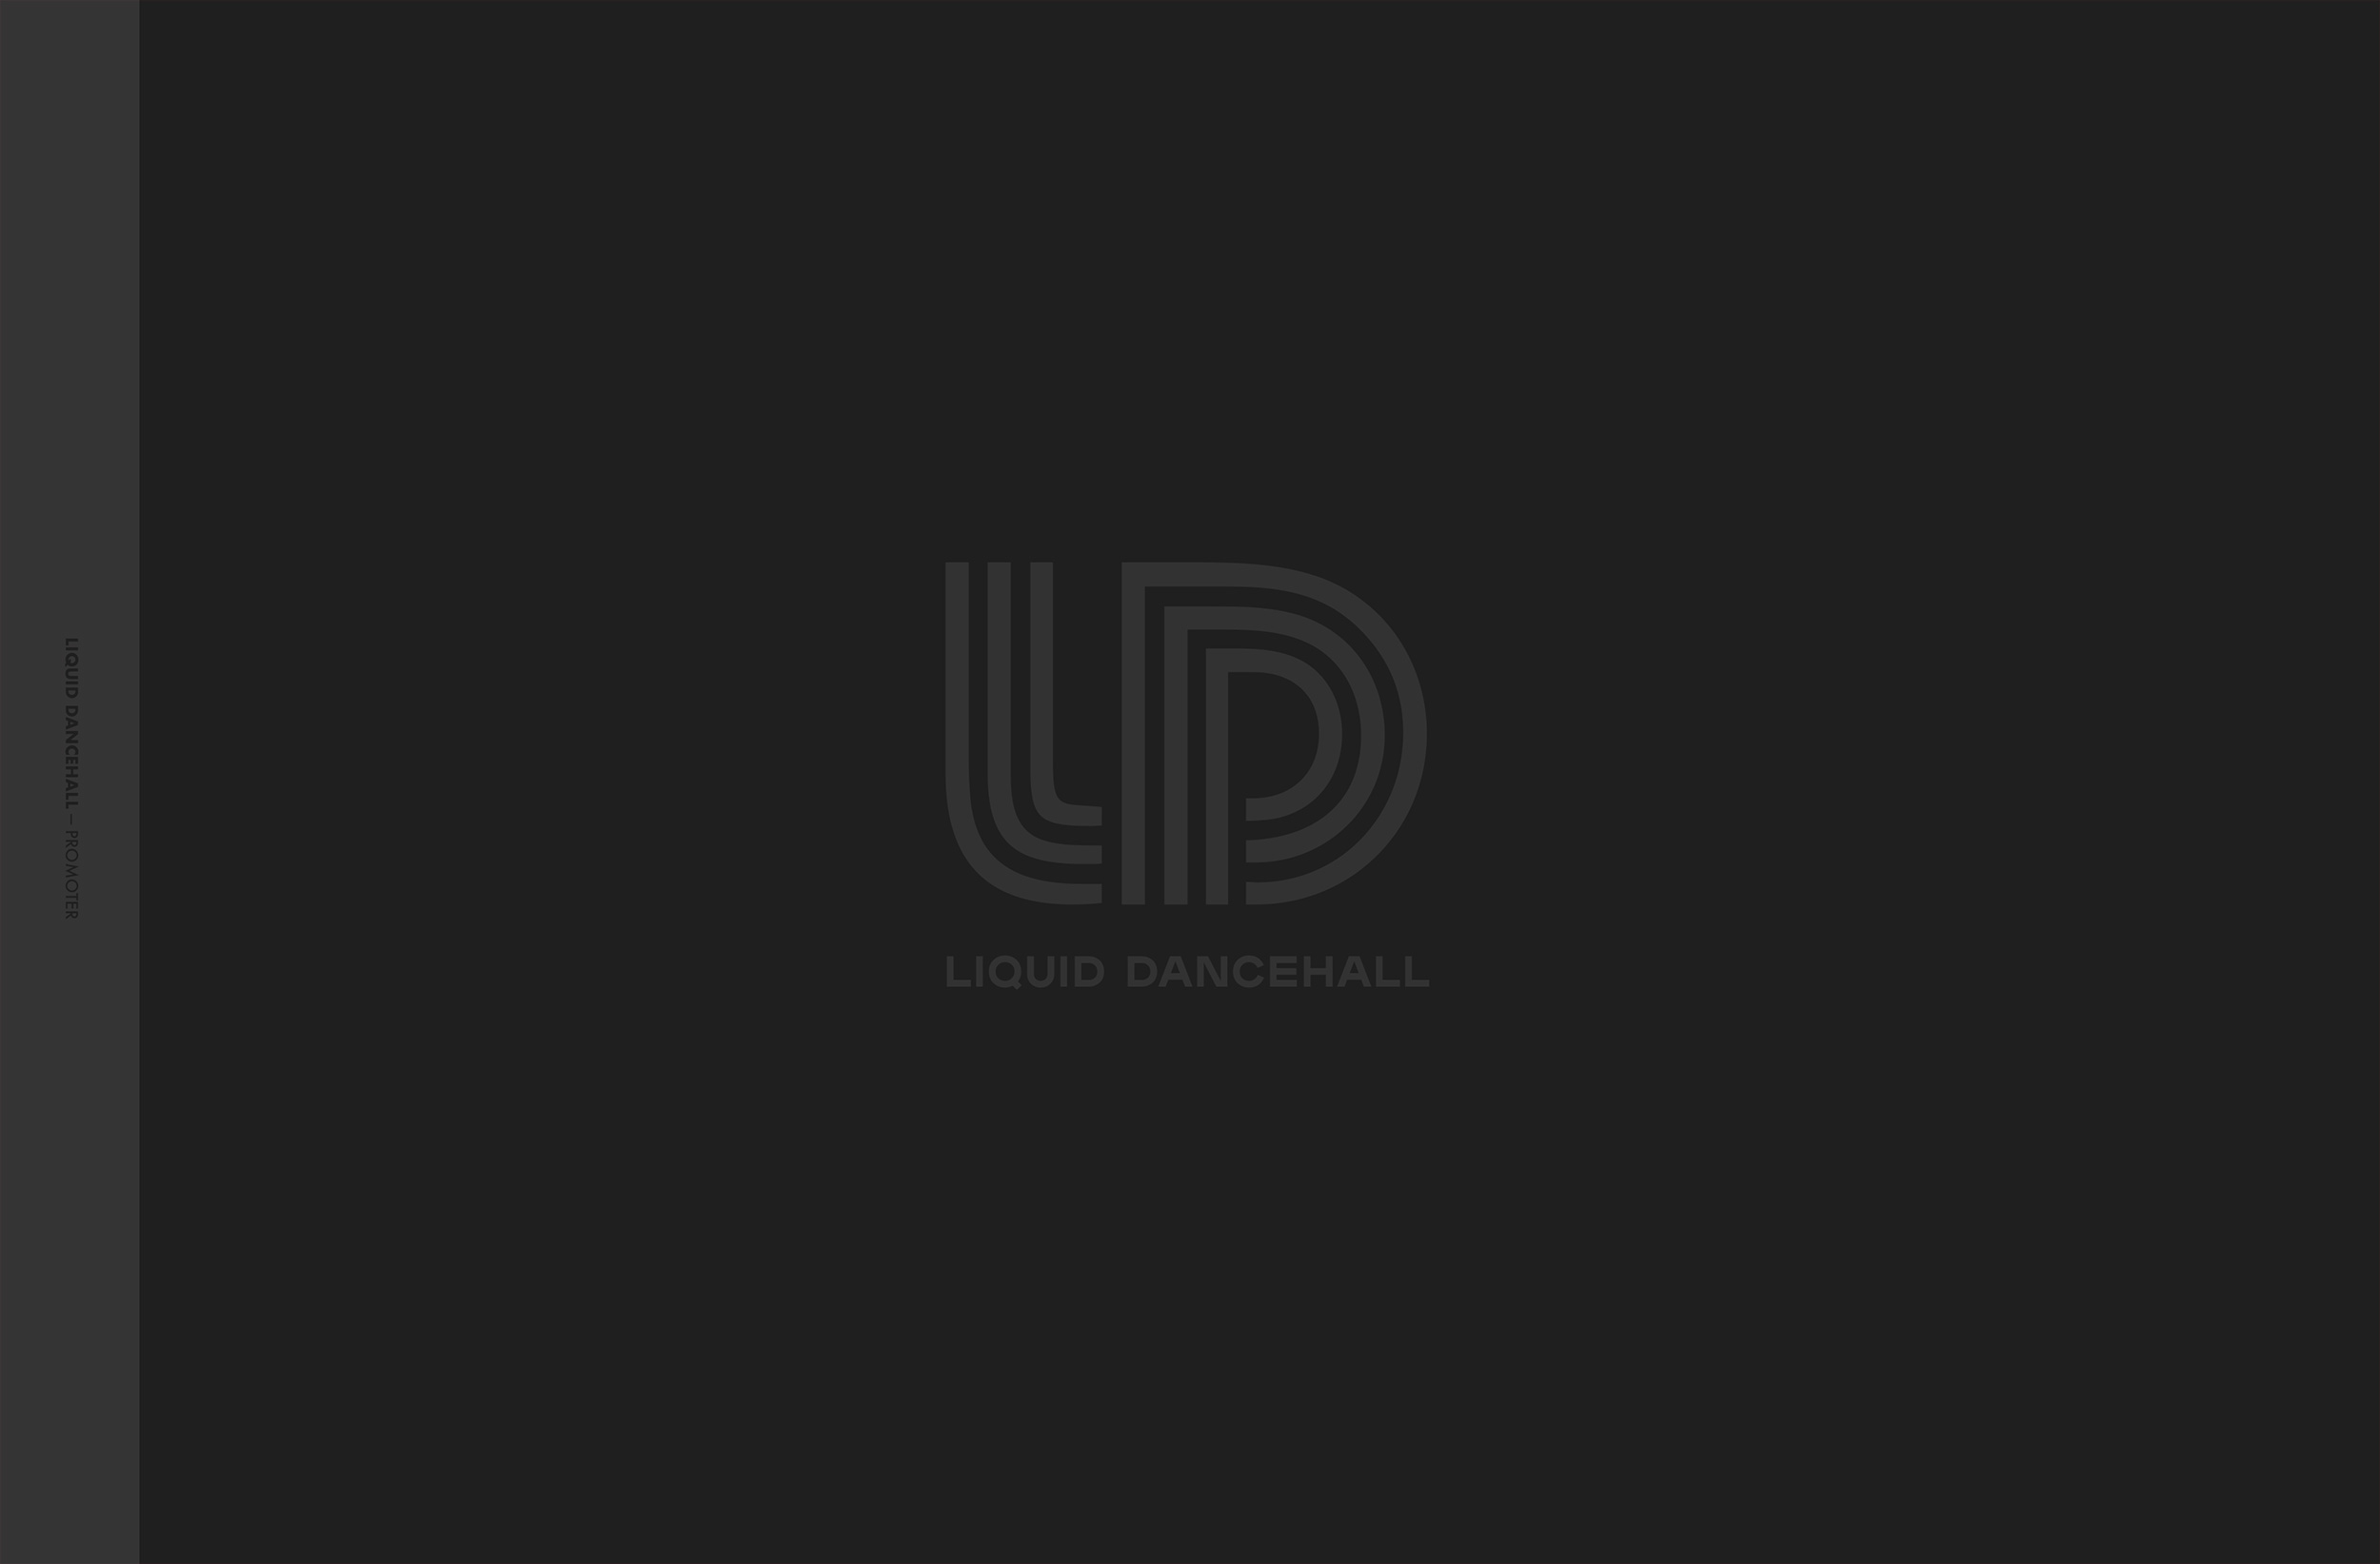 LD-logo-comp-sidebar.jpg